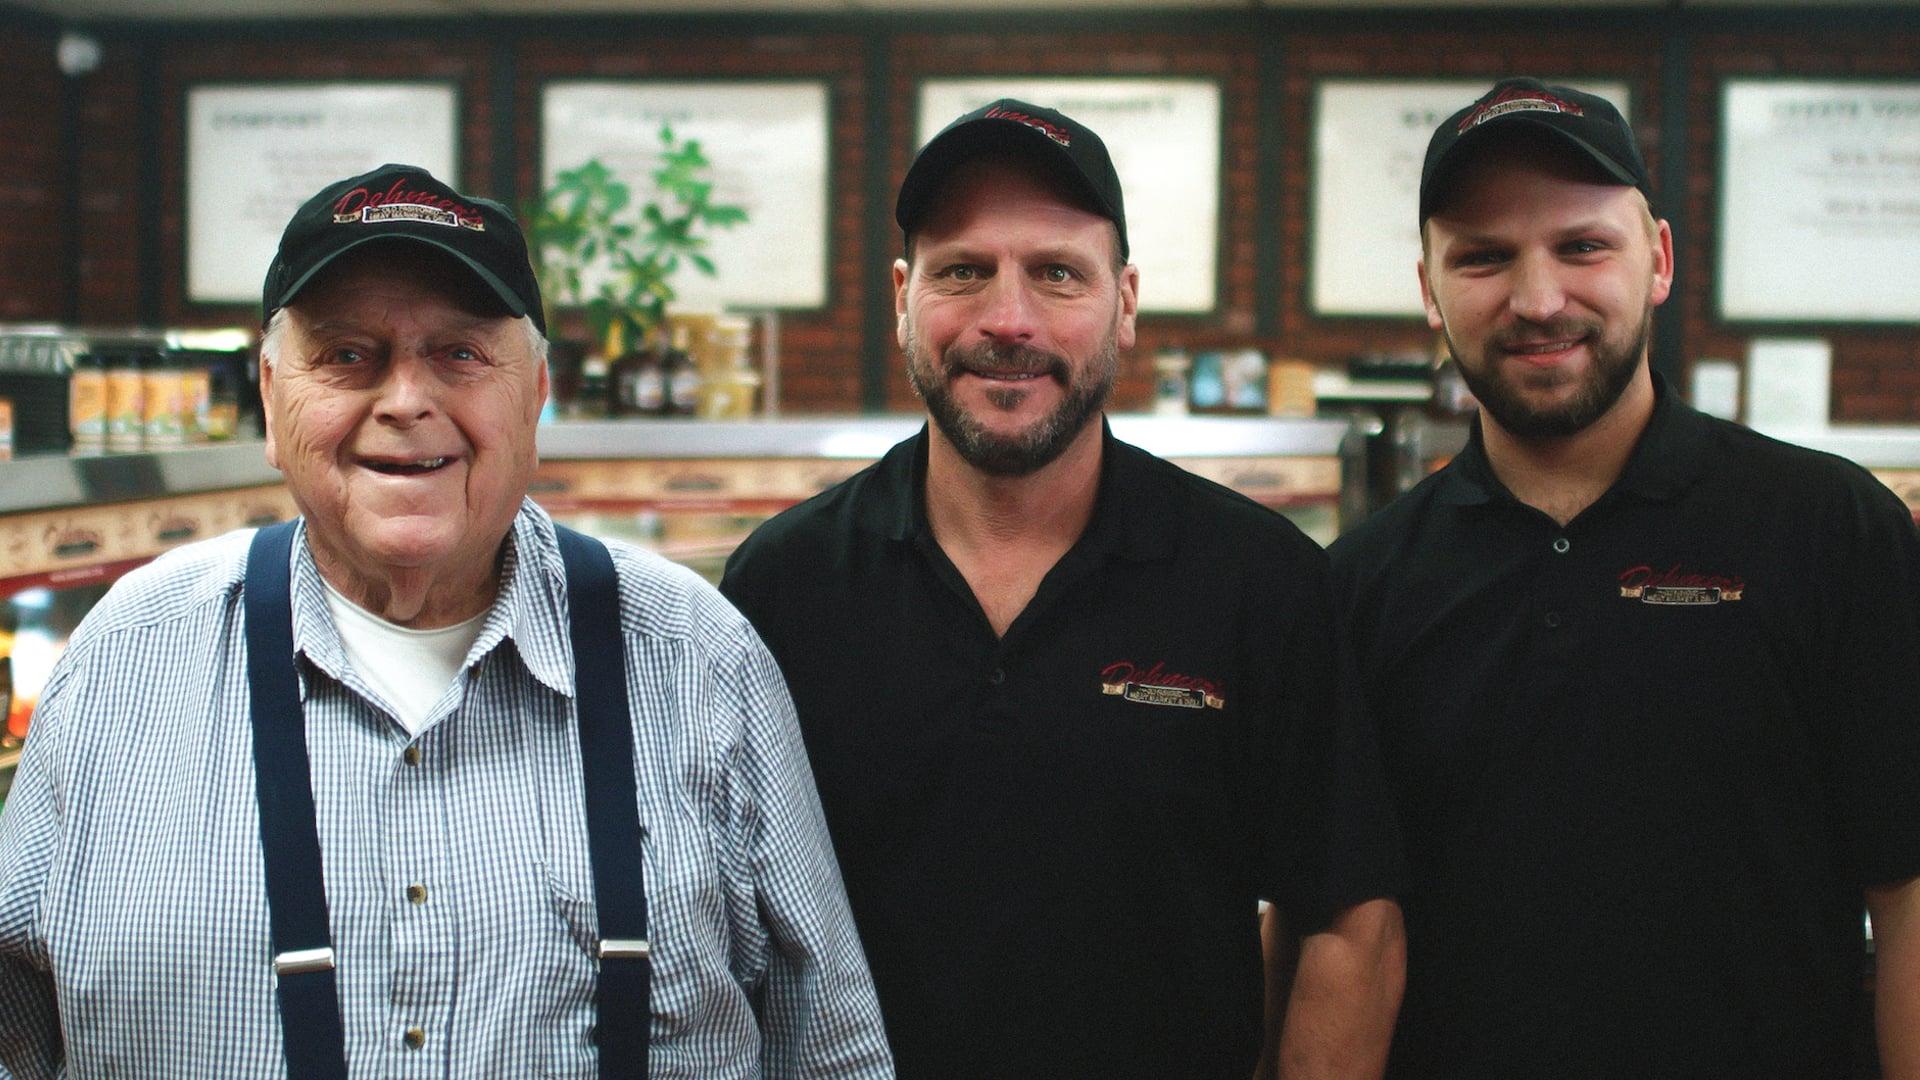 Dehmer's Meat Market - Legacy Promo